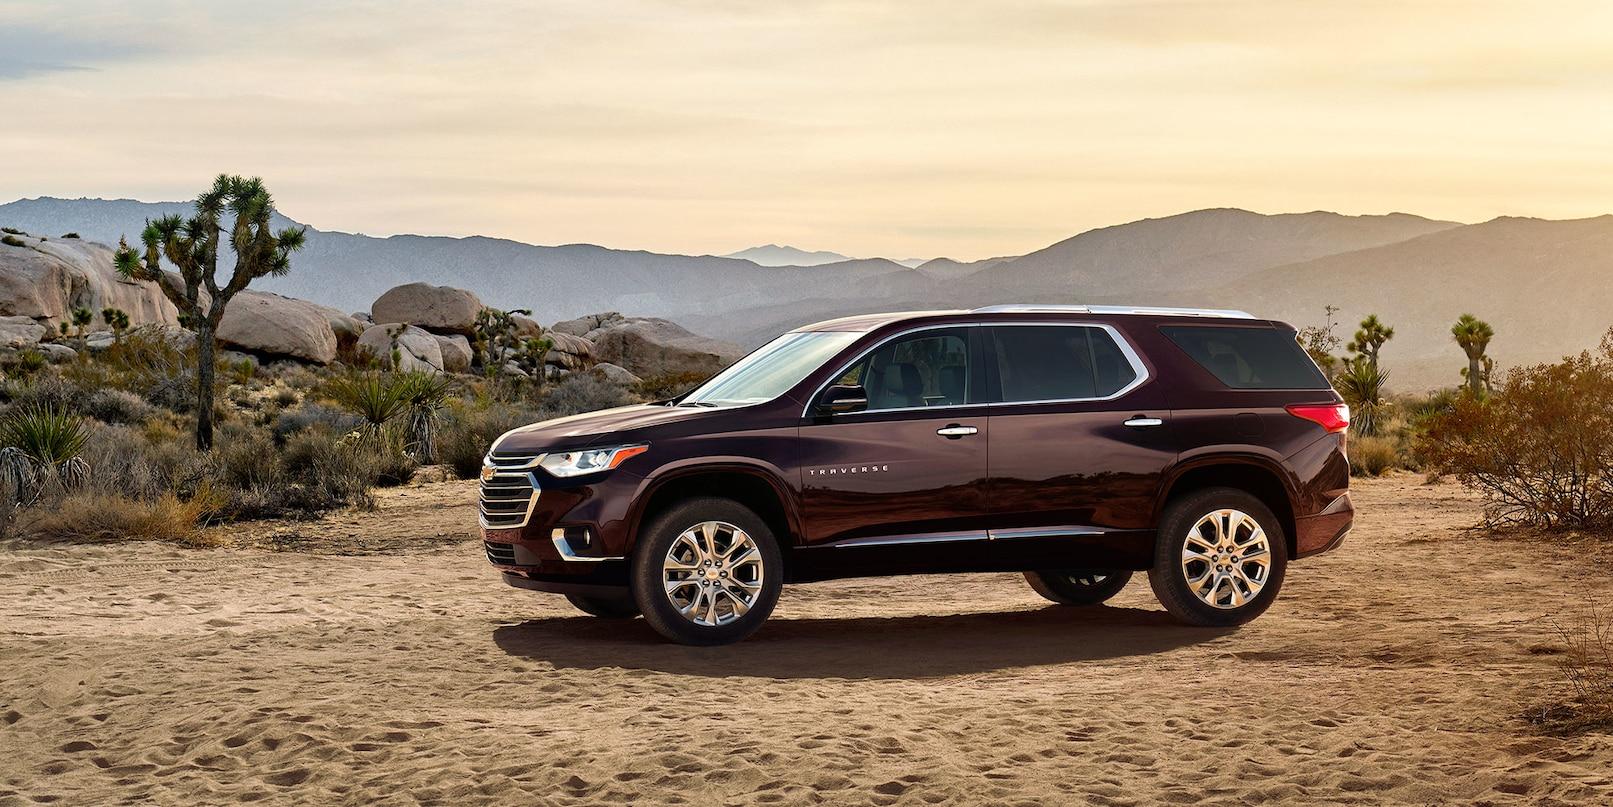 2019 Chevrolet Traverse Financing near Lapeer, MI